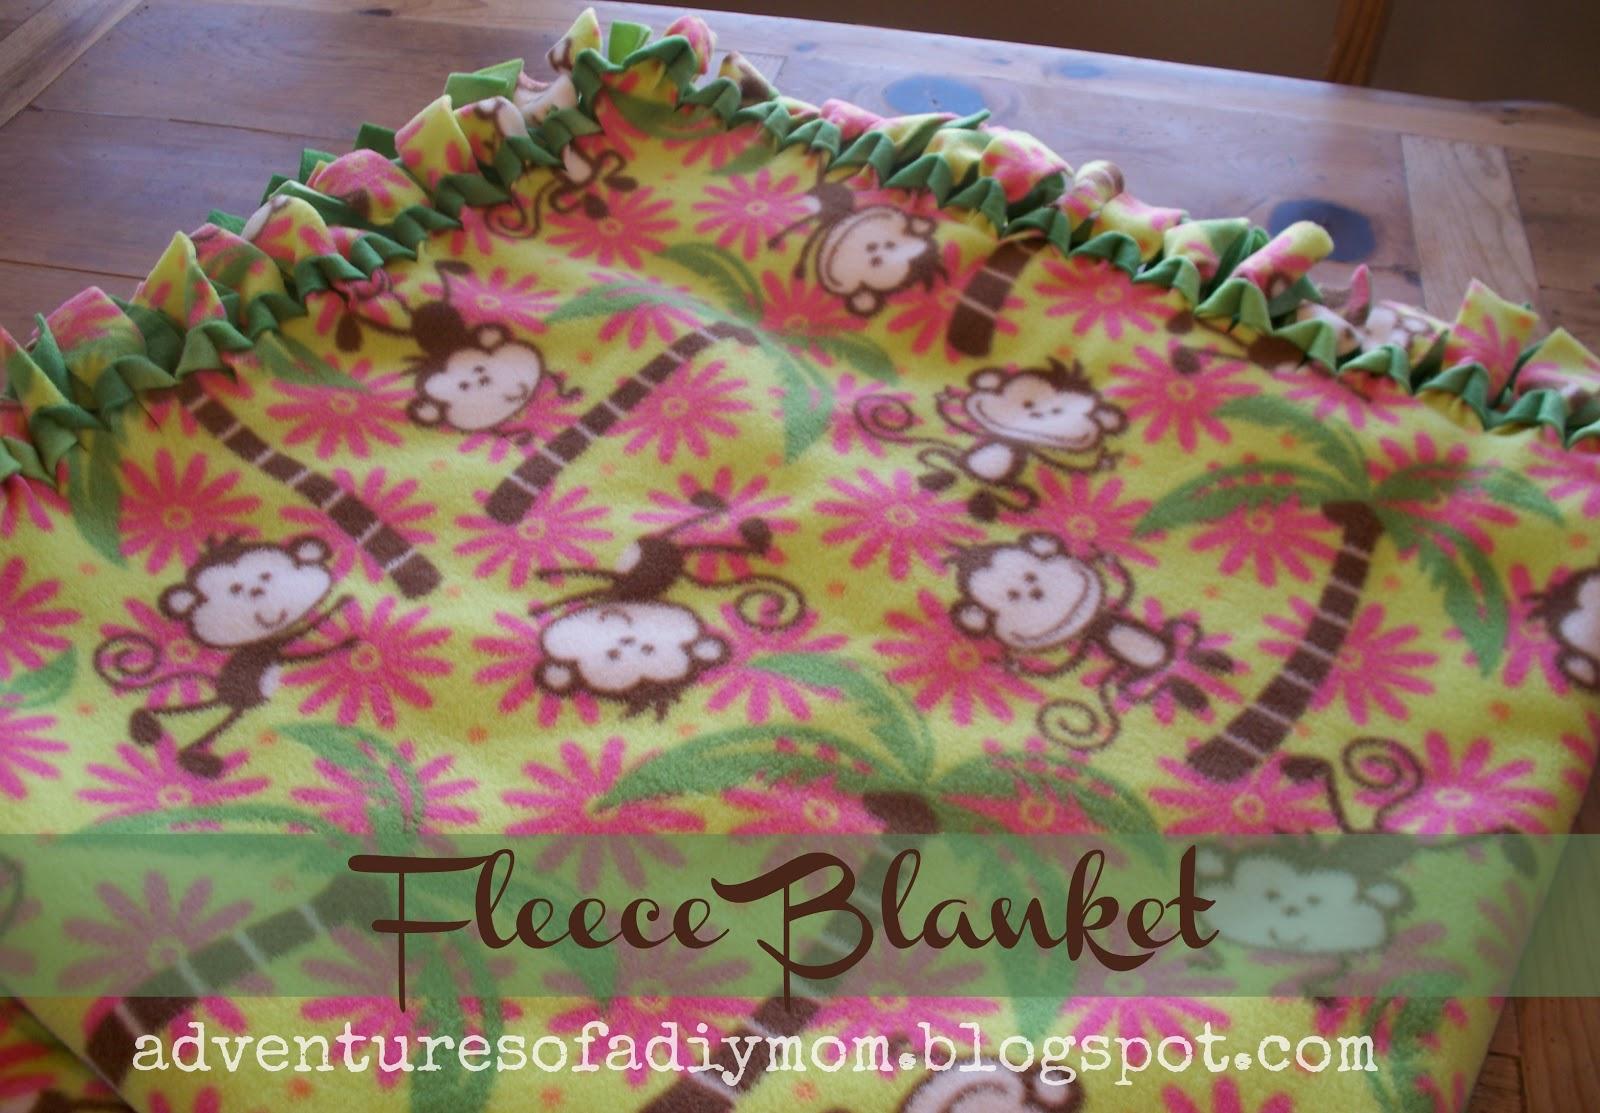 How To Make A No Sew Fleece Blanket Adventures Of A Diy Mom